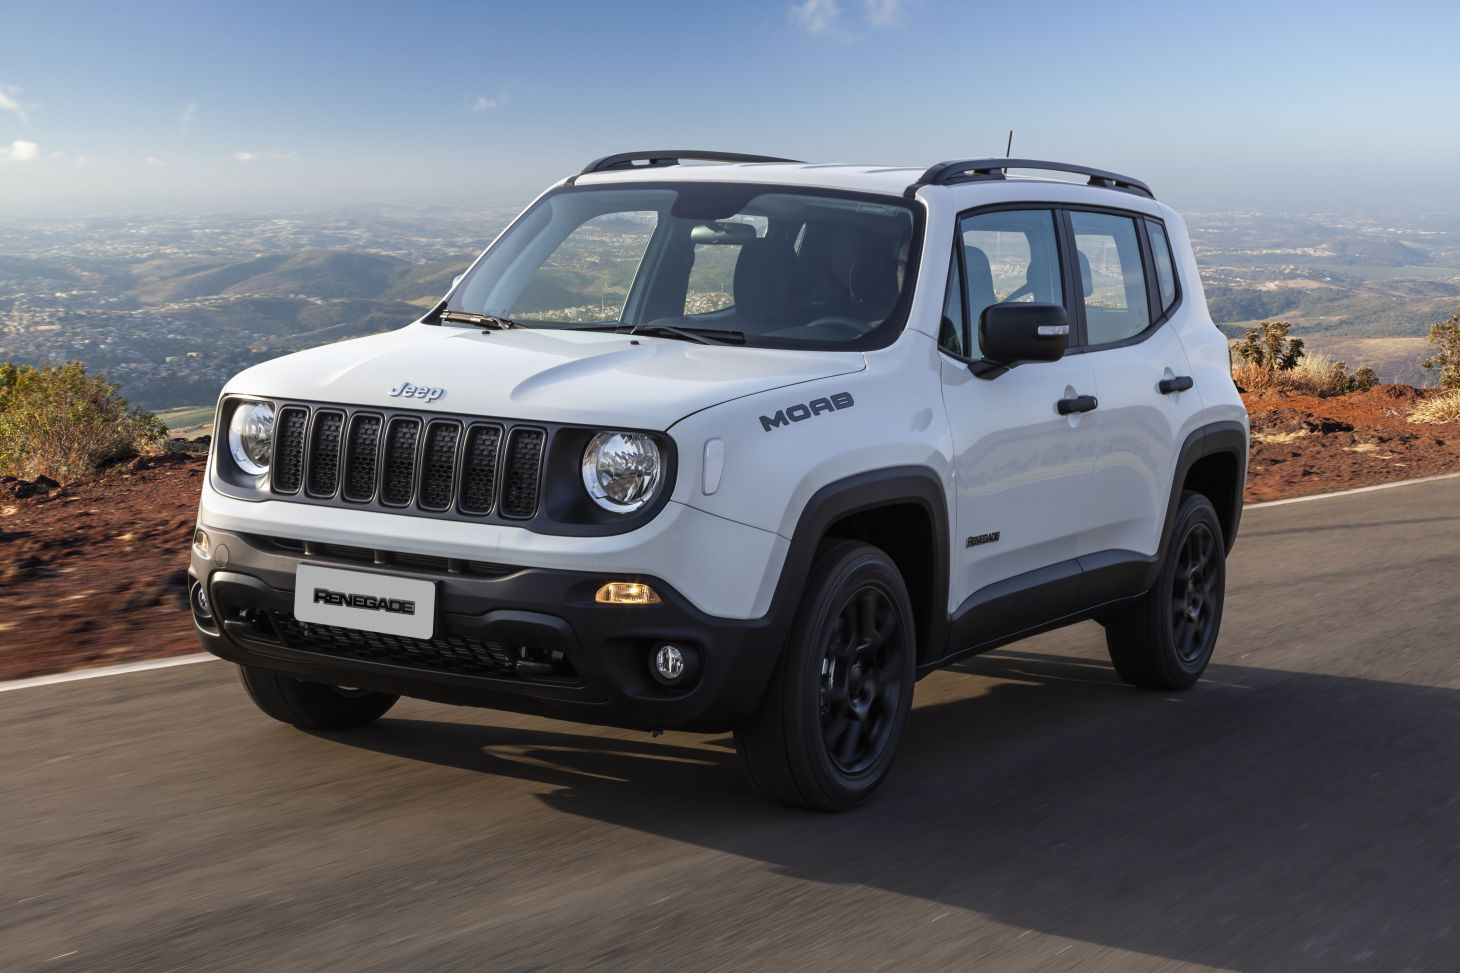 jeep renegade 2021 moab branco estrada